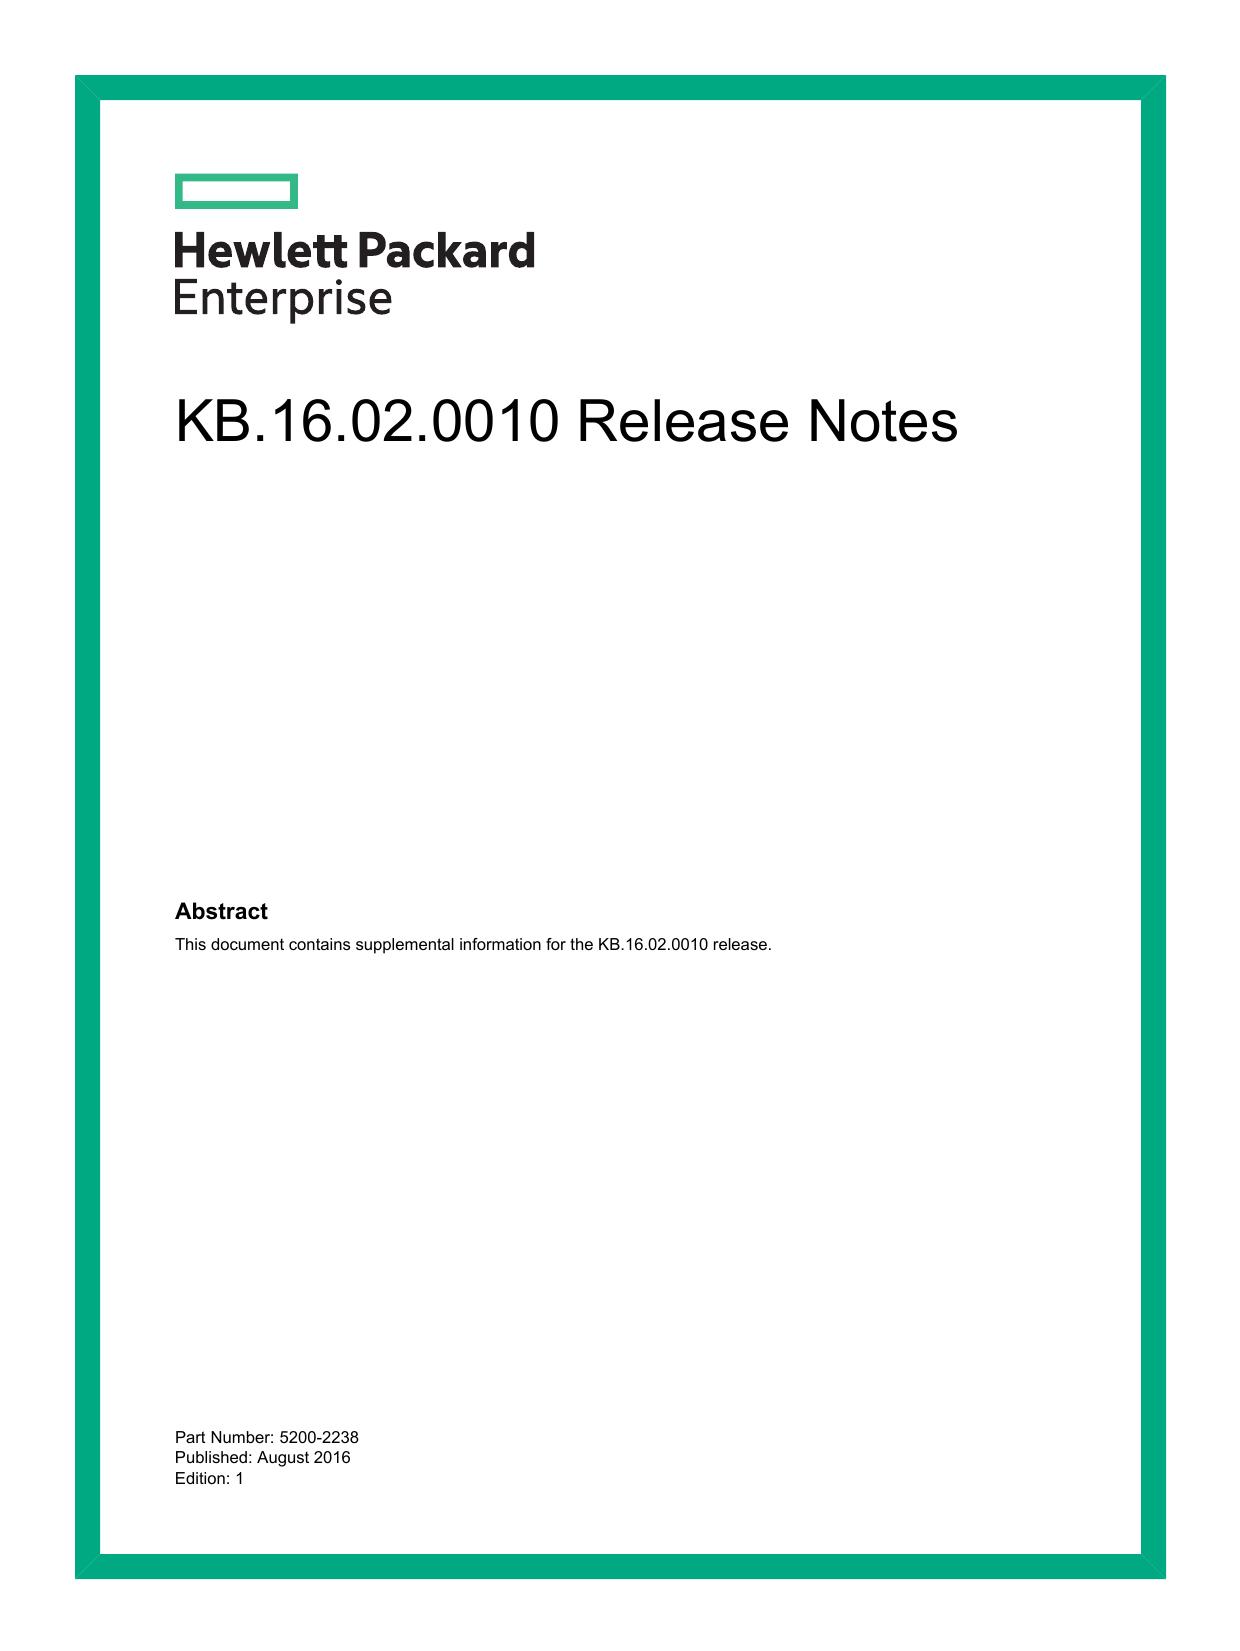 KB 16 02 0010 Release Notes | manualzz com